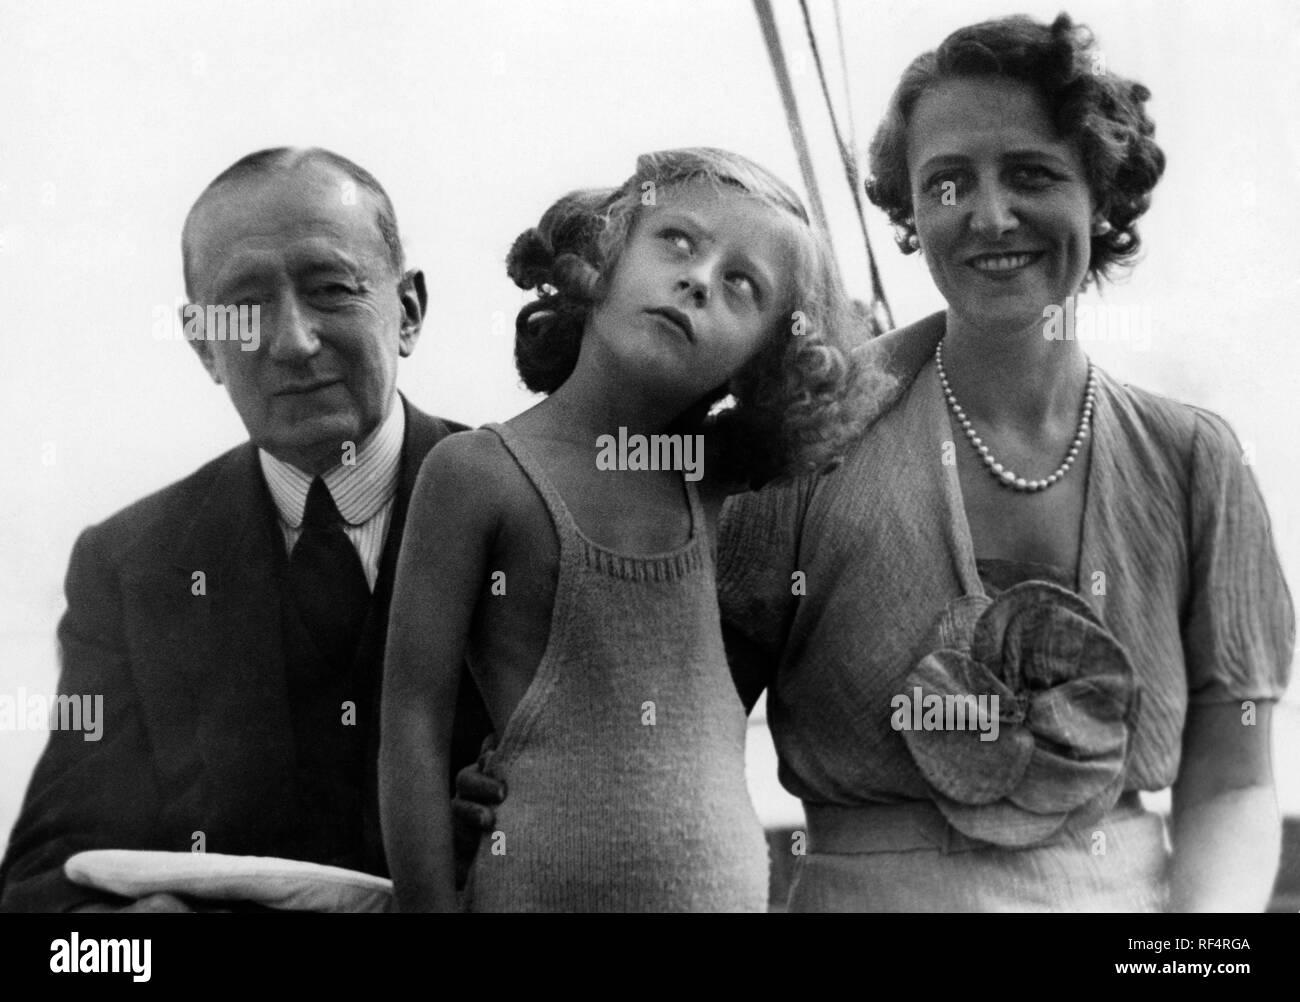 Elettra Marconi y familia, 1936 Foto de stock